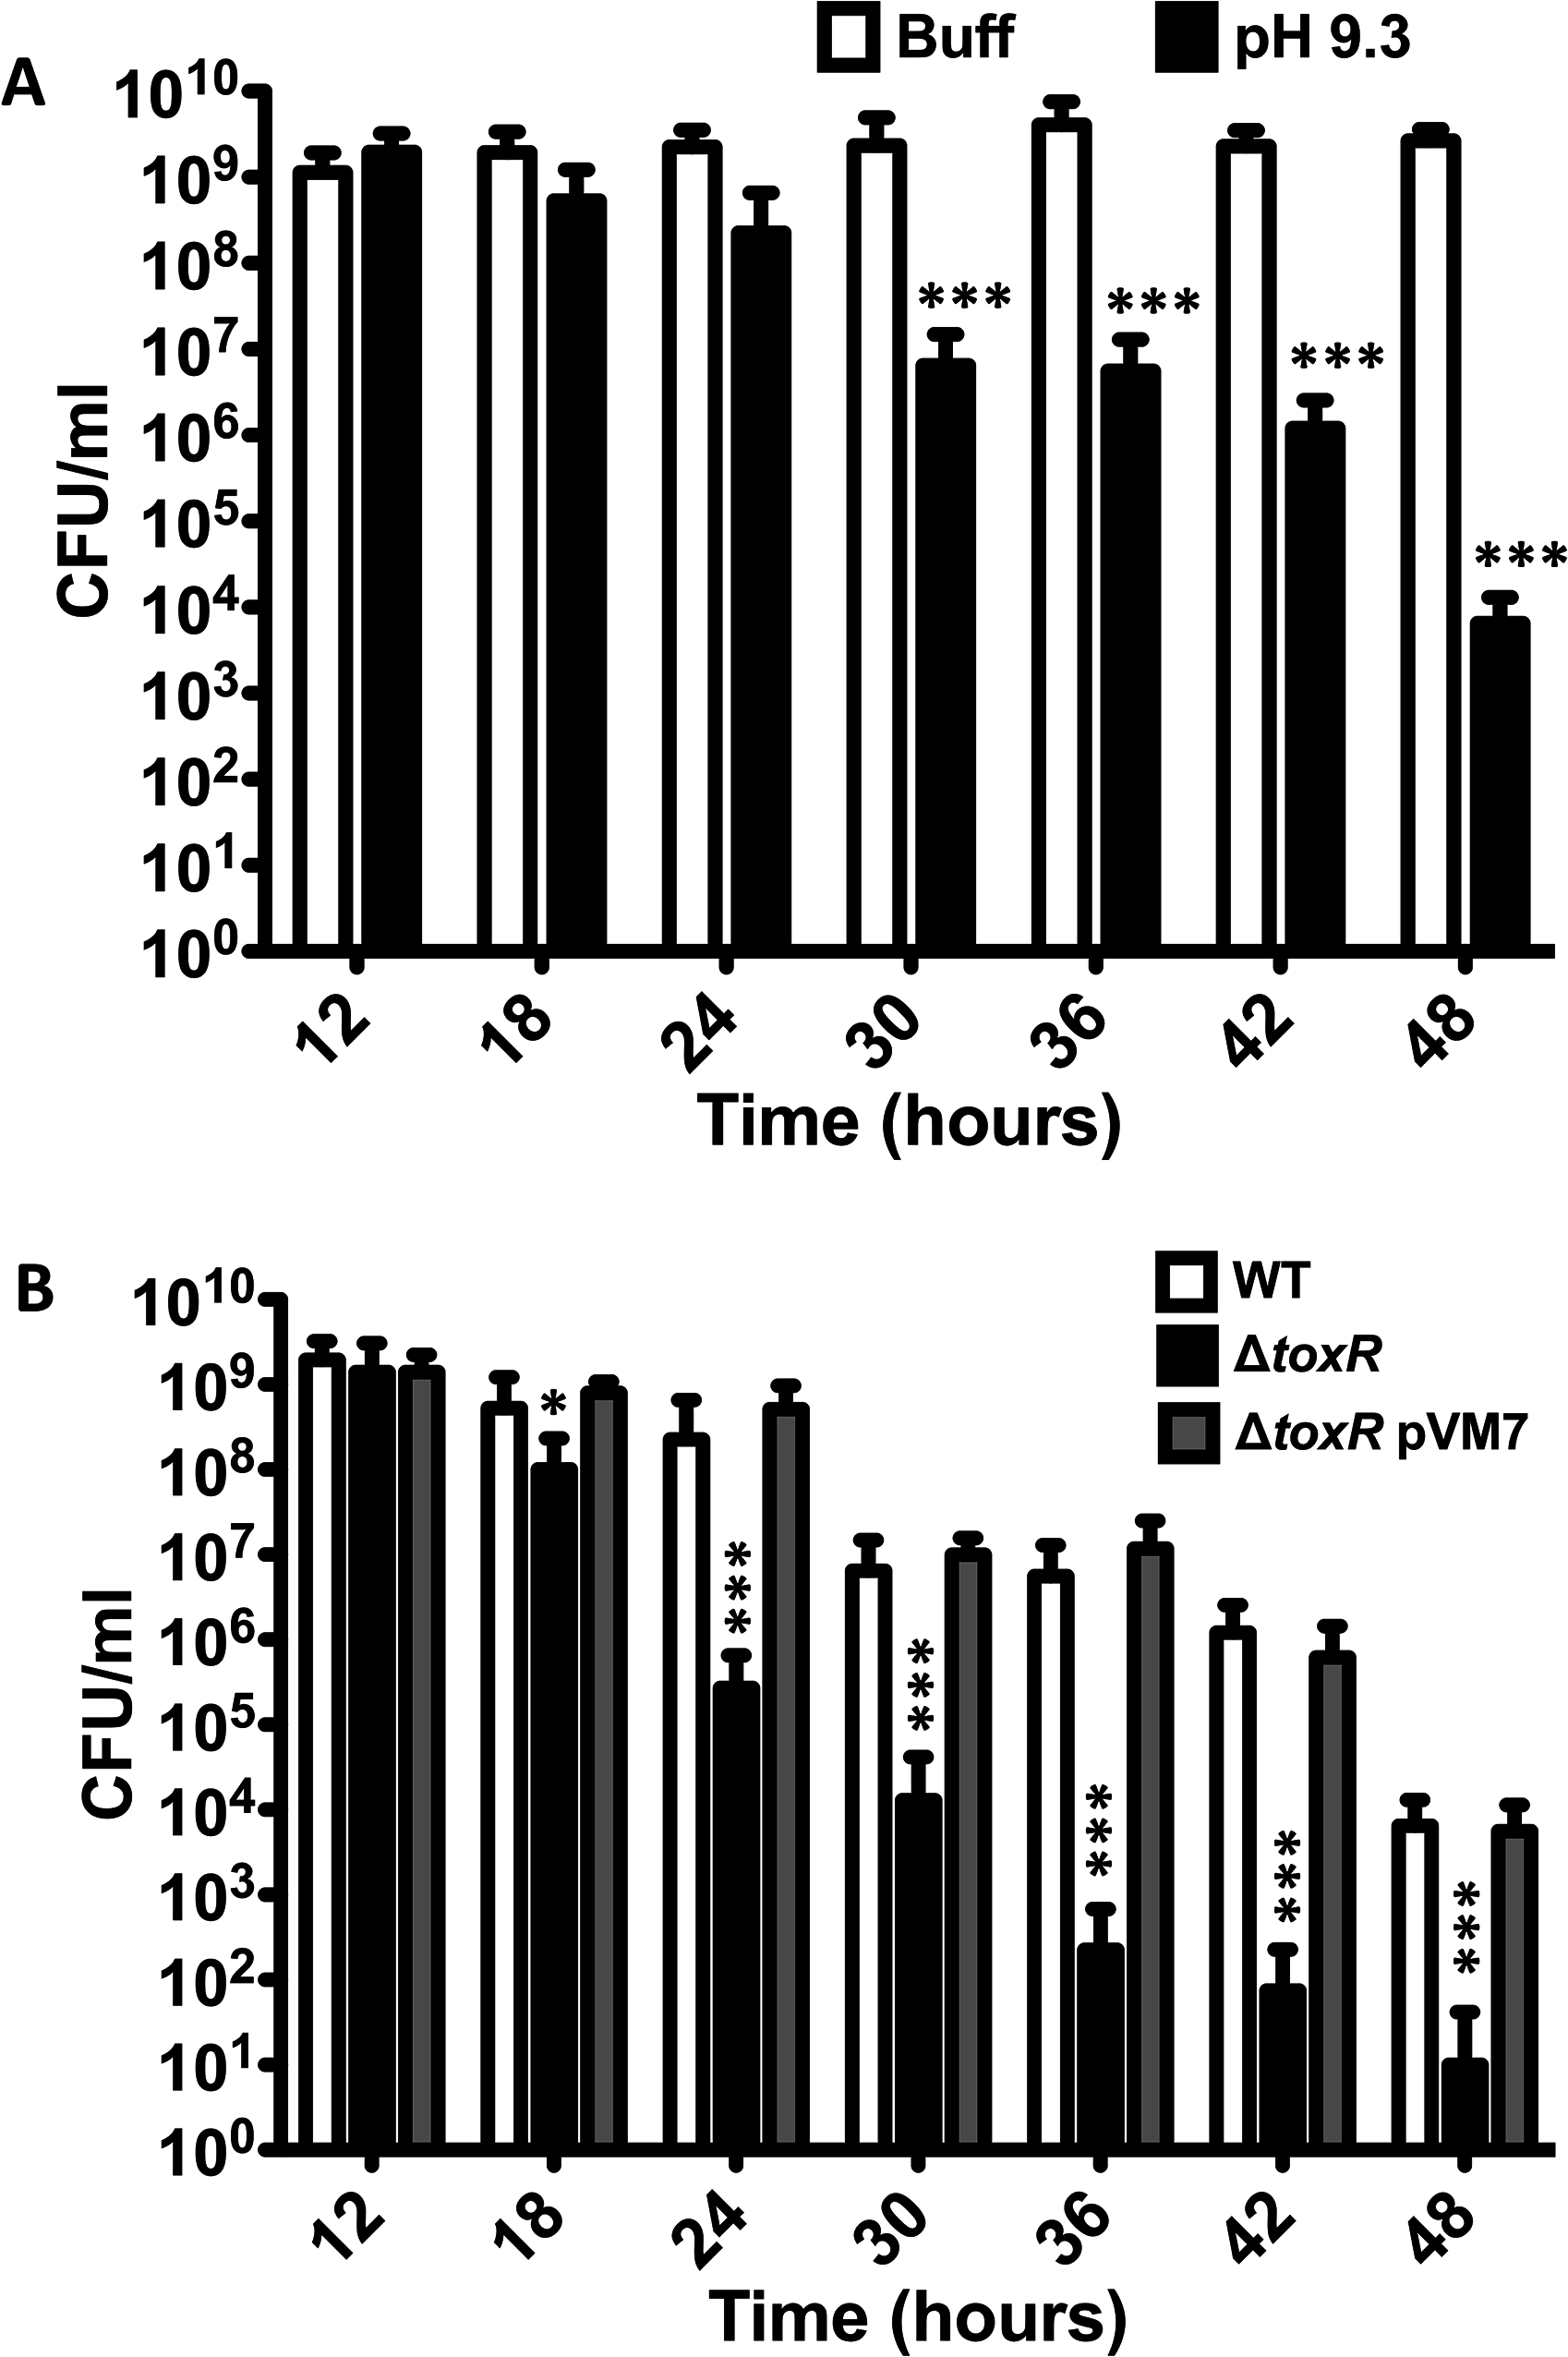 <i>V</i>. <i>cholerae</i> shows reduced culturability over time at alkaline pH.